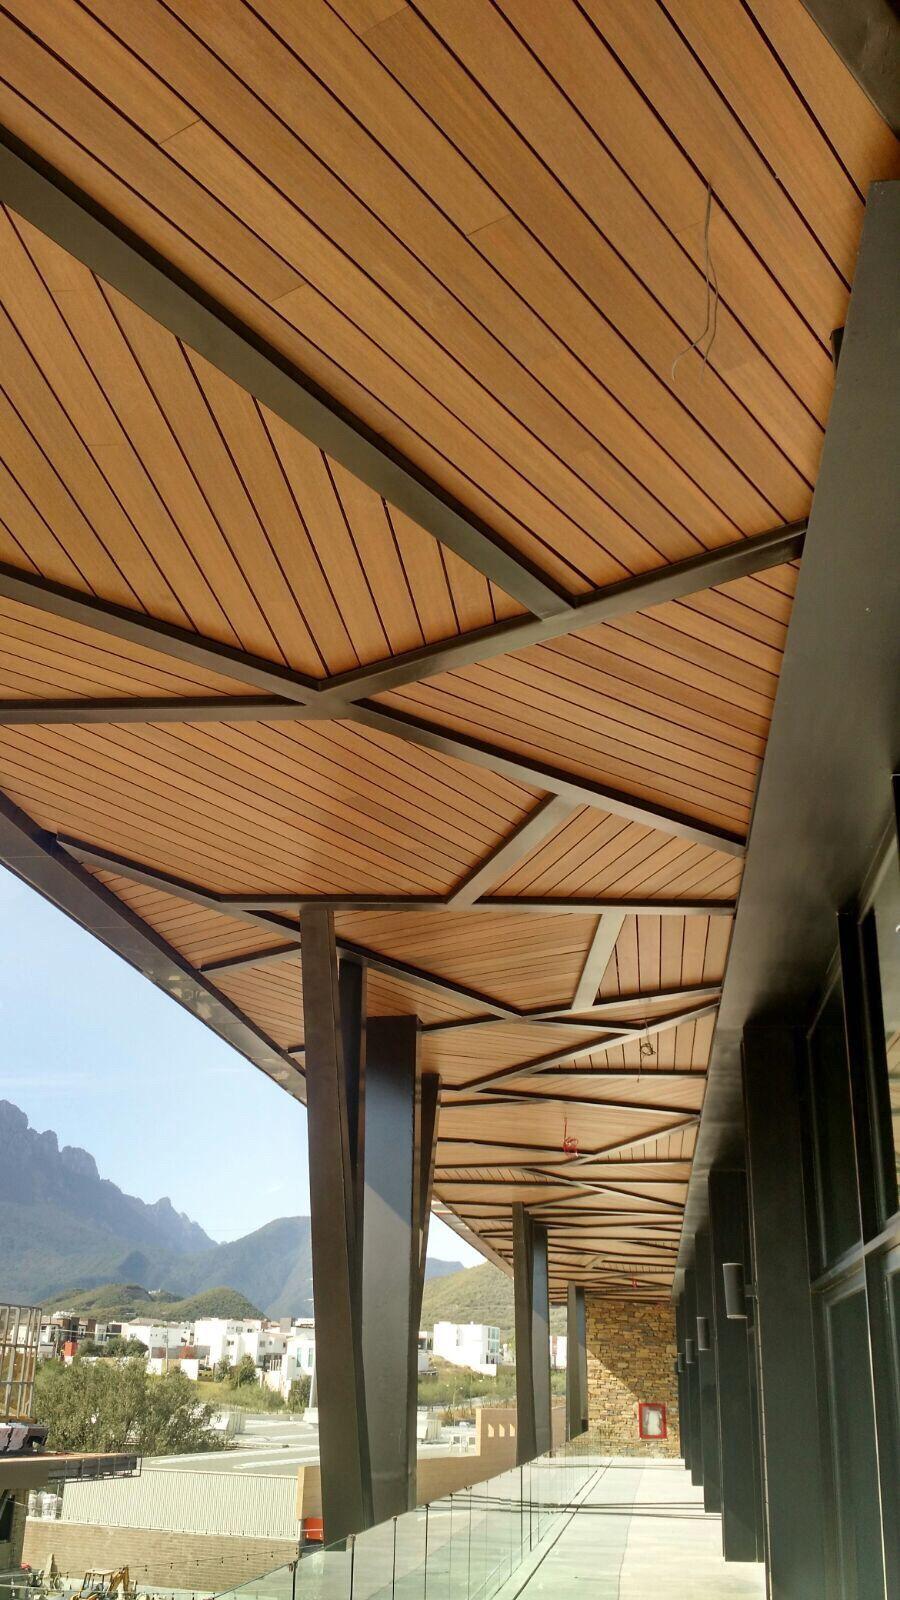 Newtechwood Cladding Ceiling Cladding Cladding Timber Cladding